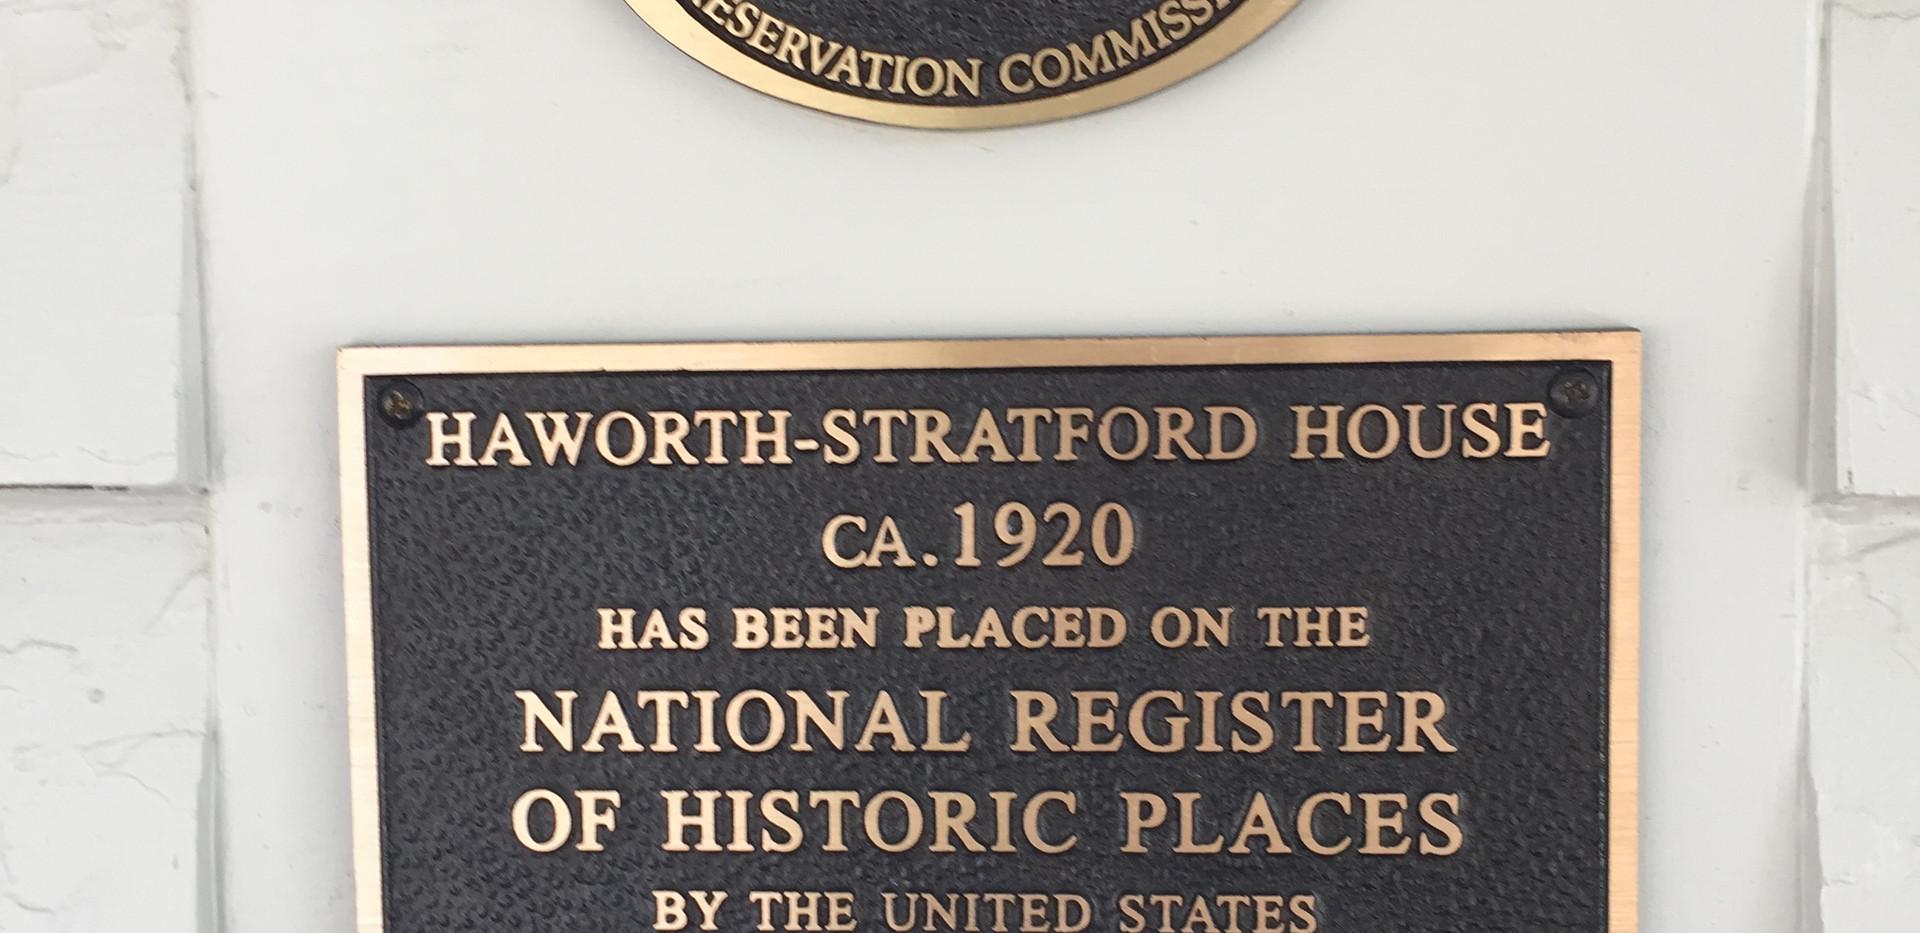 Haworth Stratford House ca. 1920